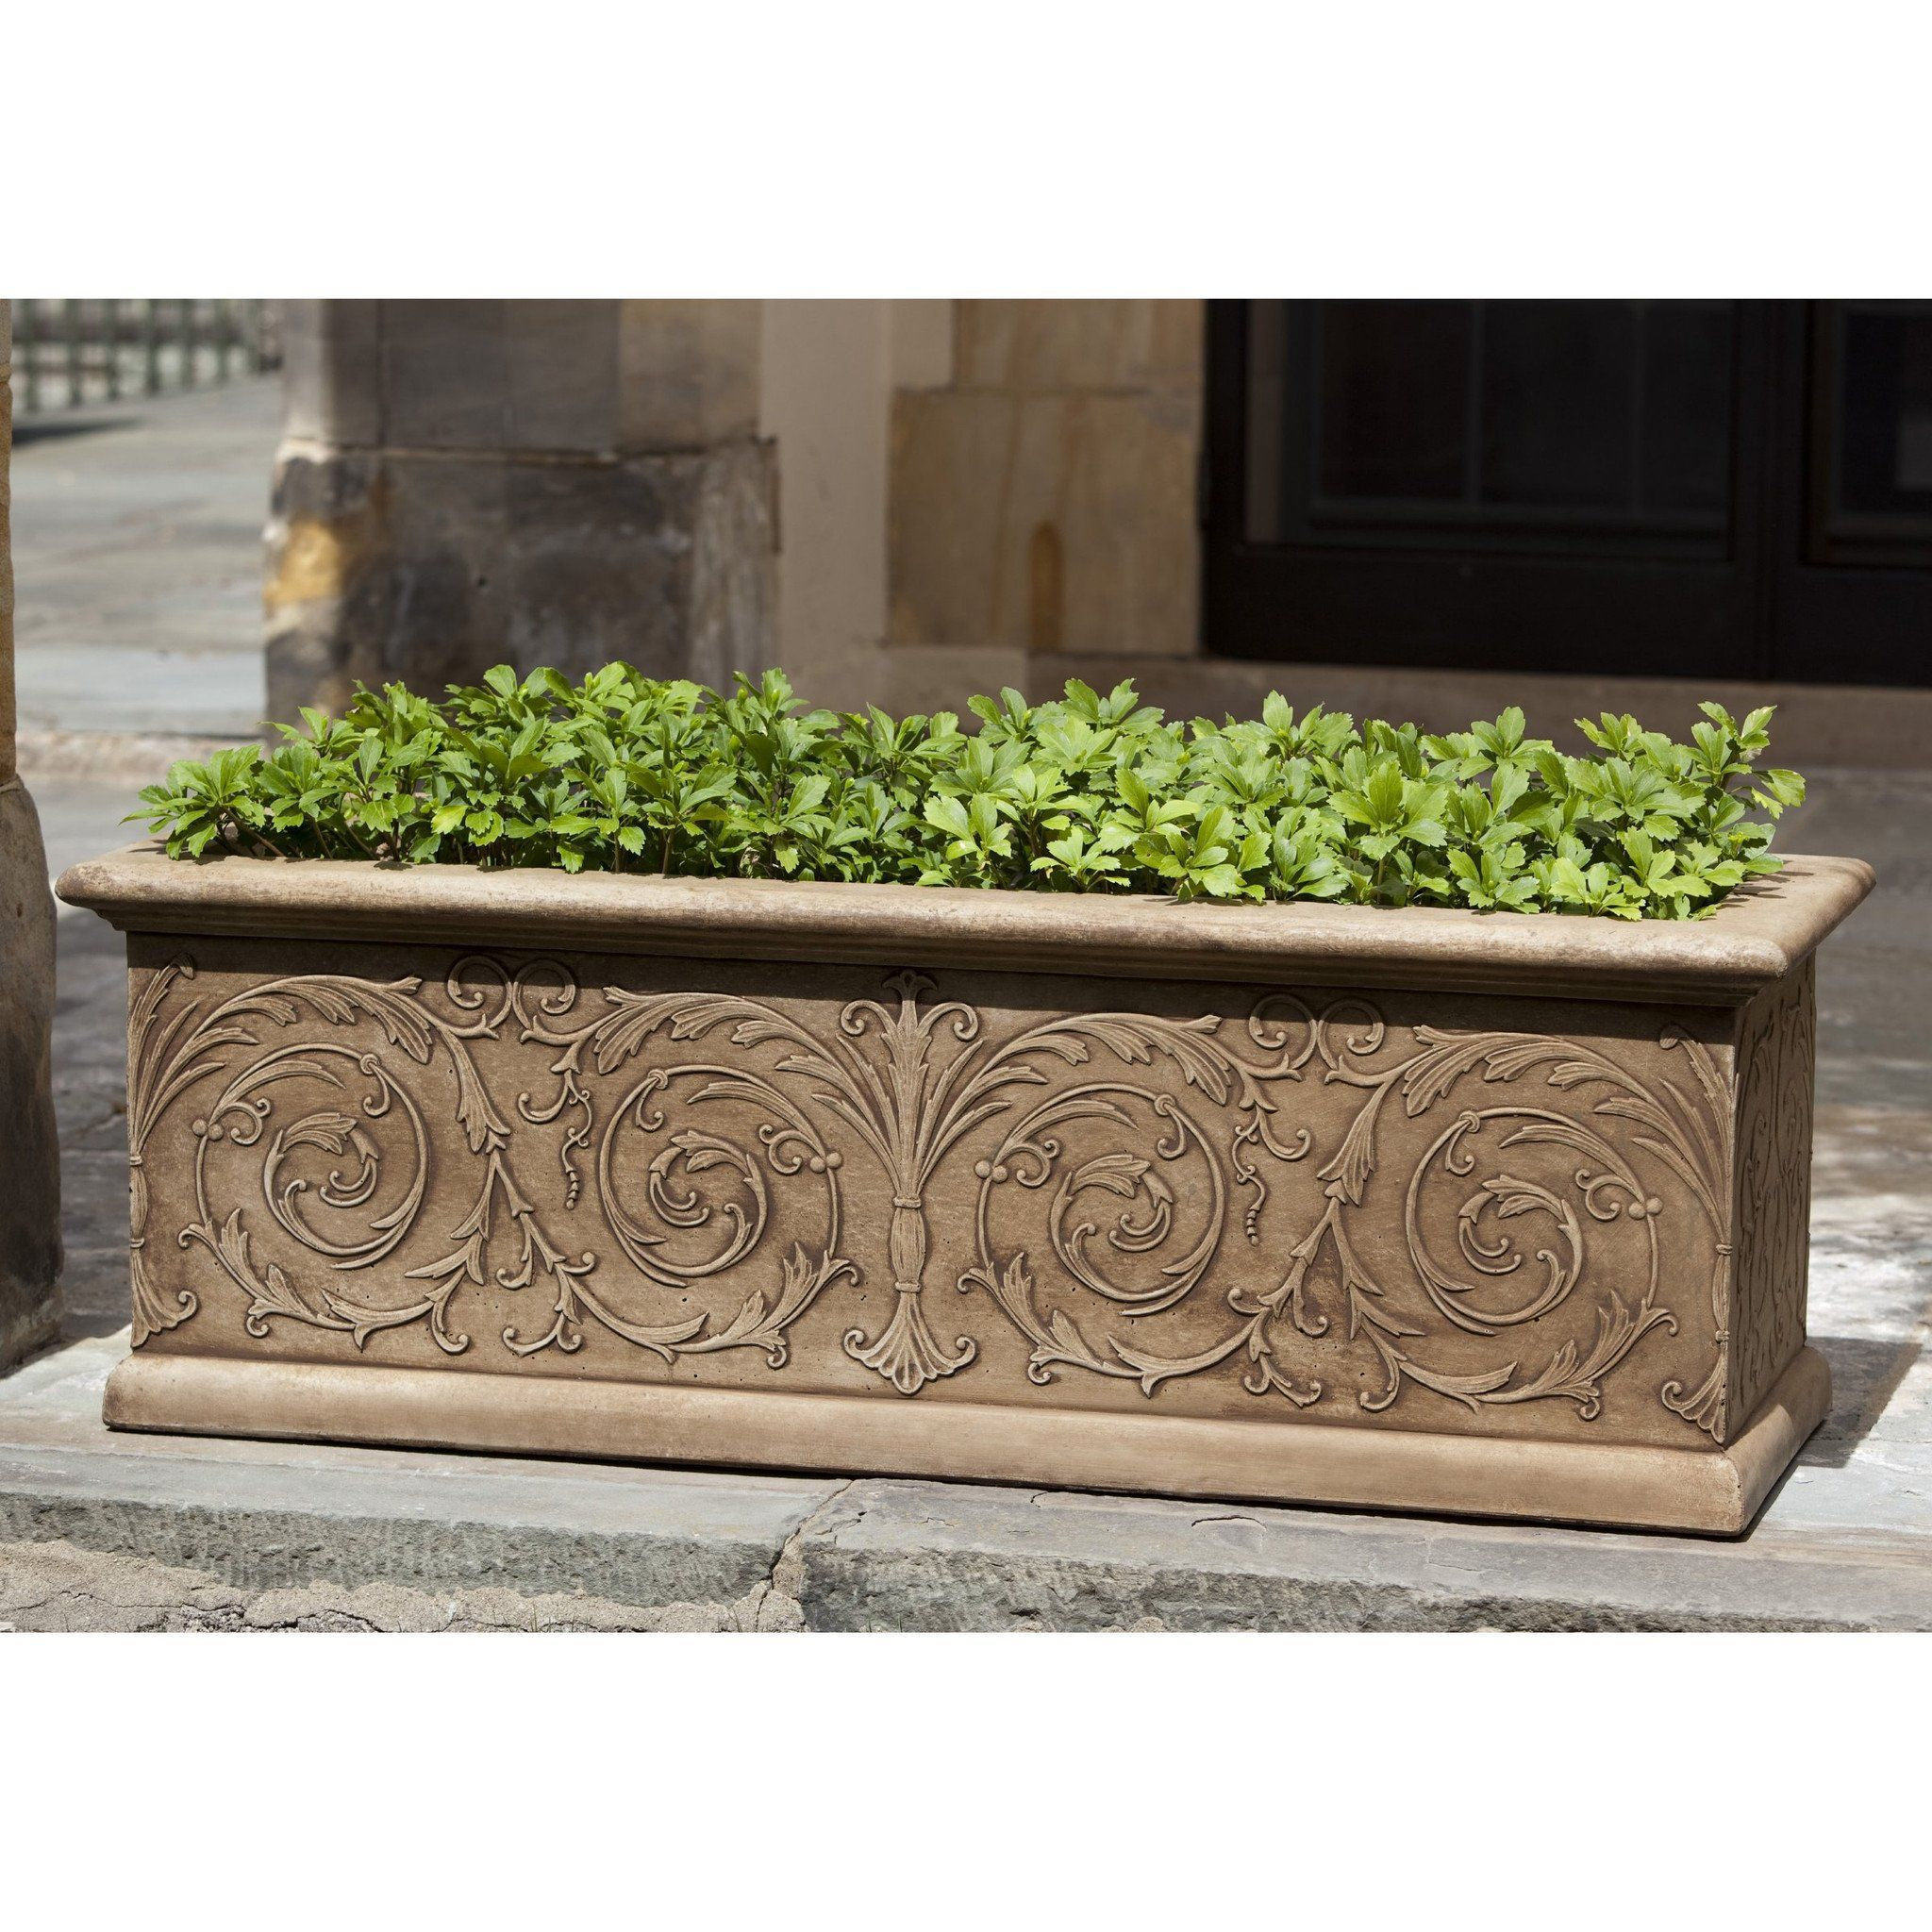 Arabesque Small Window Box Stone Planters Diy Stone Patio Rectangle Planters